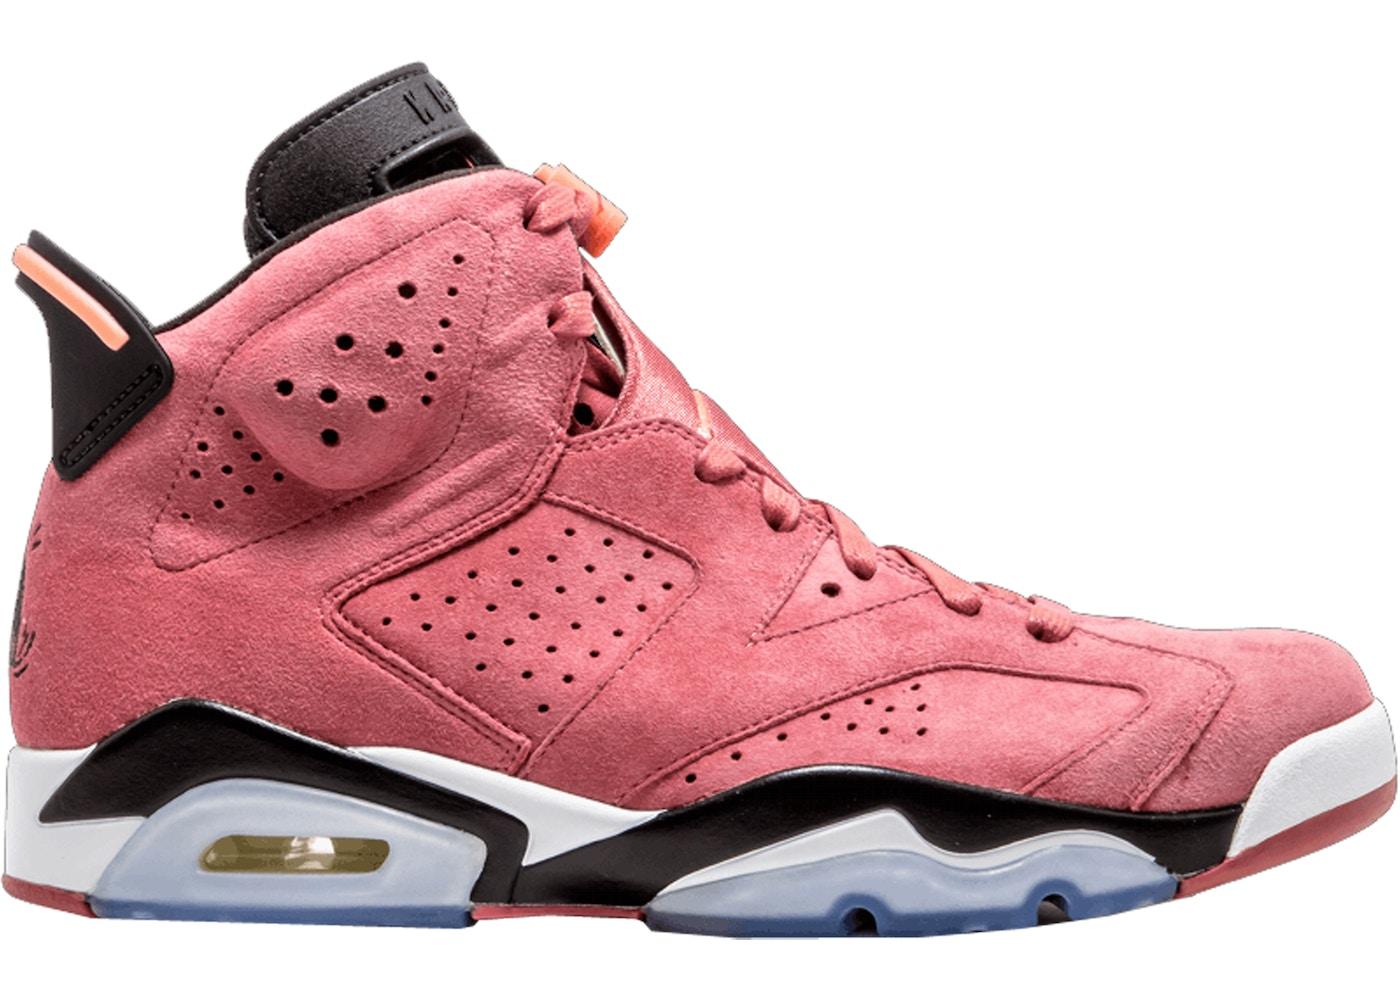 e313cd440ee3 Buy Air Jordan 6 Size 16 Shoes   Deadstock Sneakers